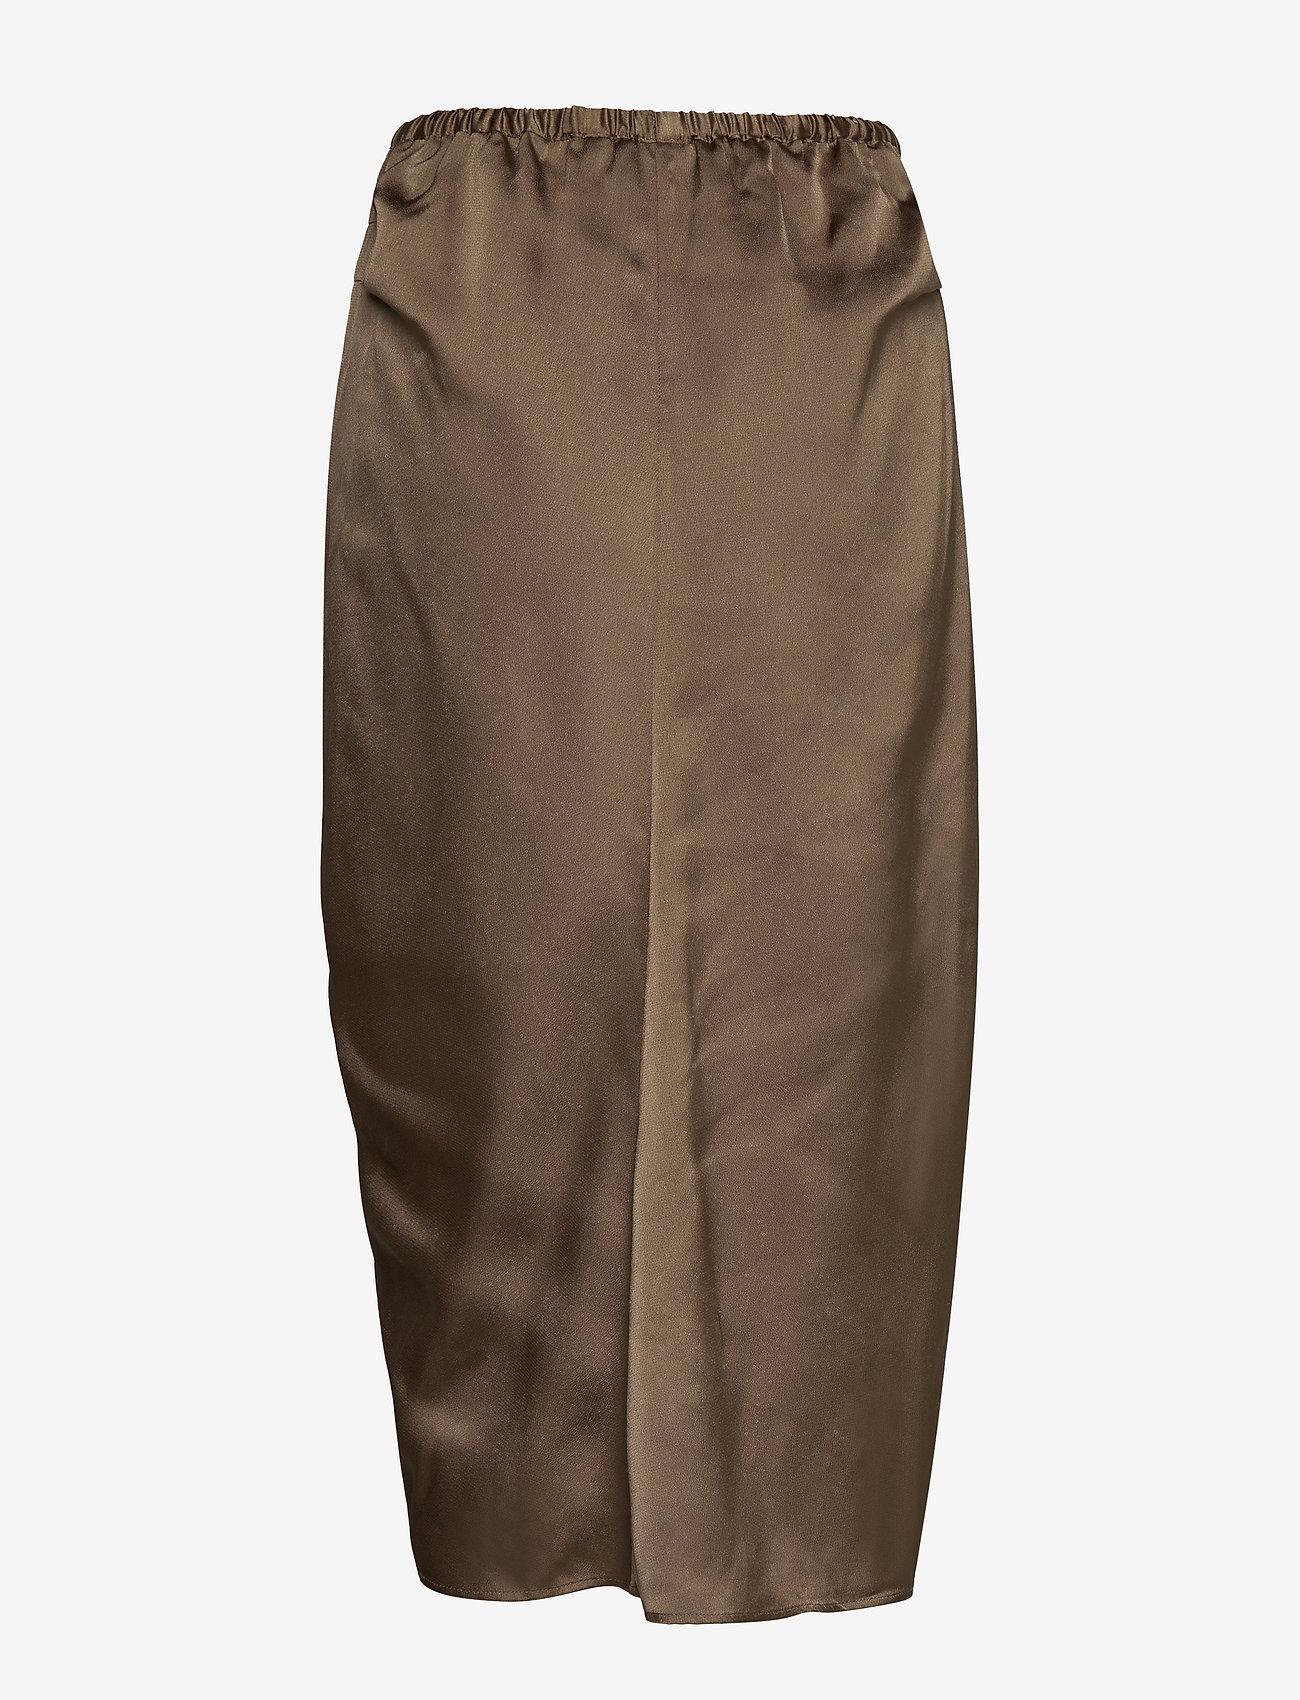 DESIGNERS, REMIX - Ruched pencil skirt - midi - khaki - 1